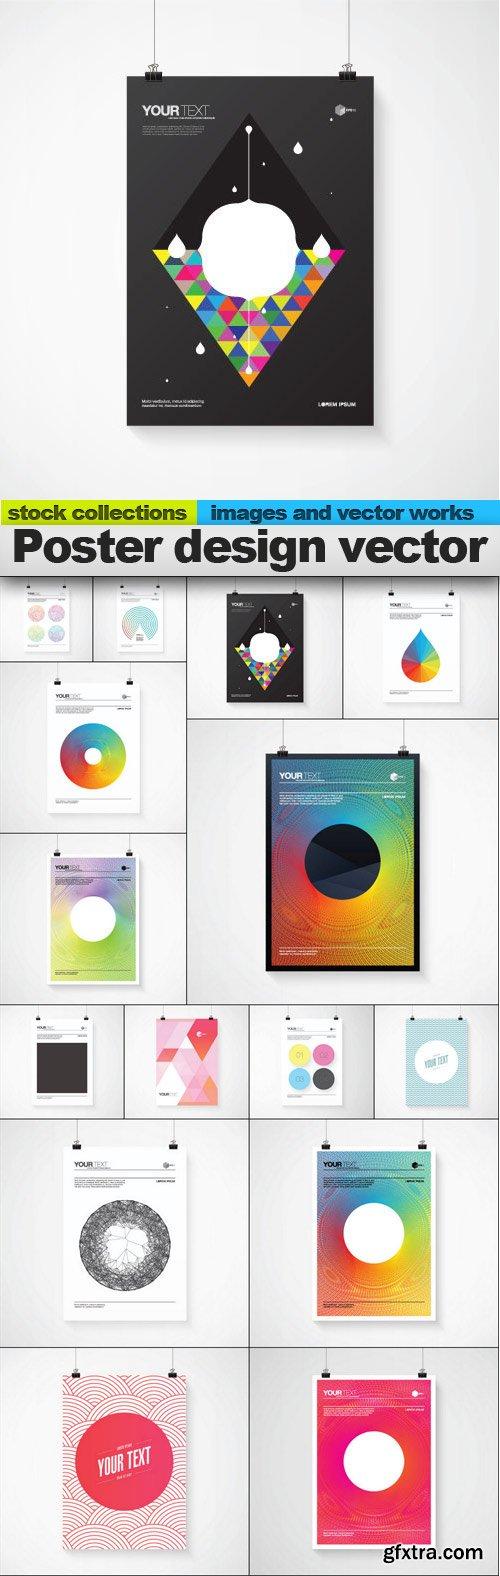 Poster design vector, 15 x EPS